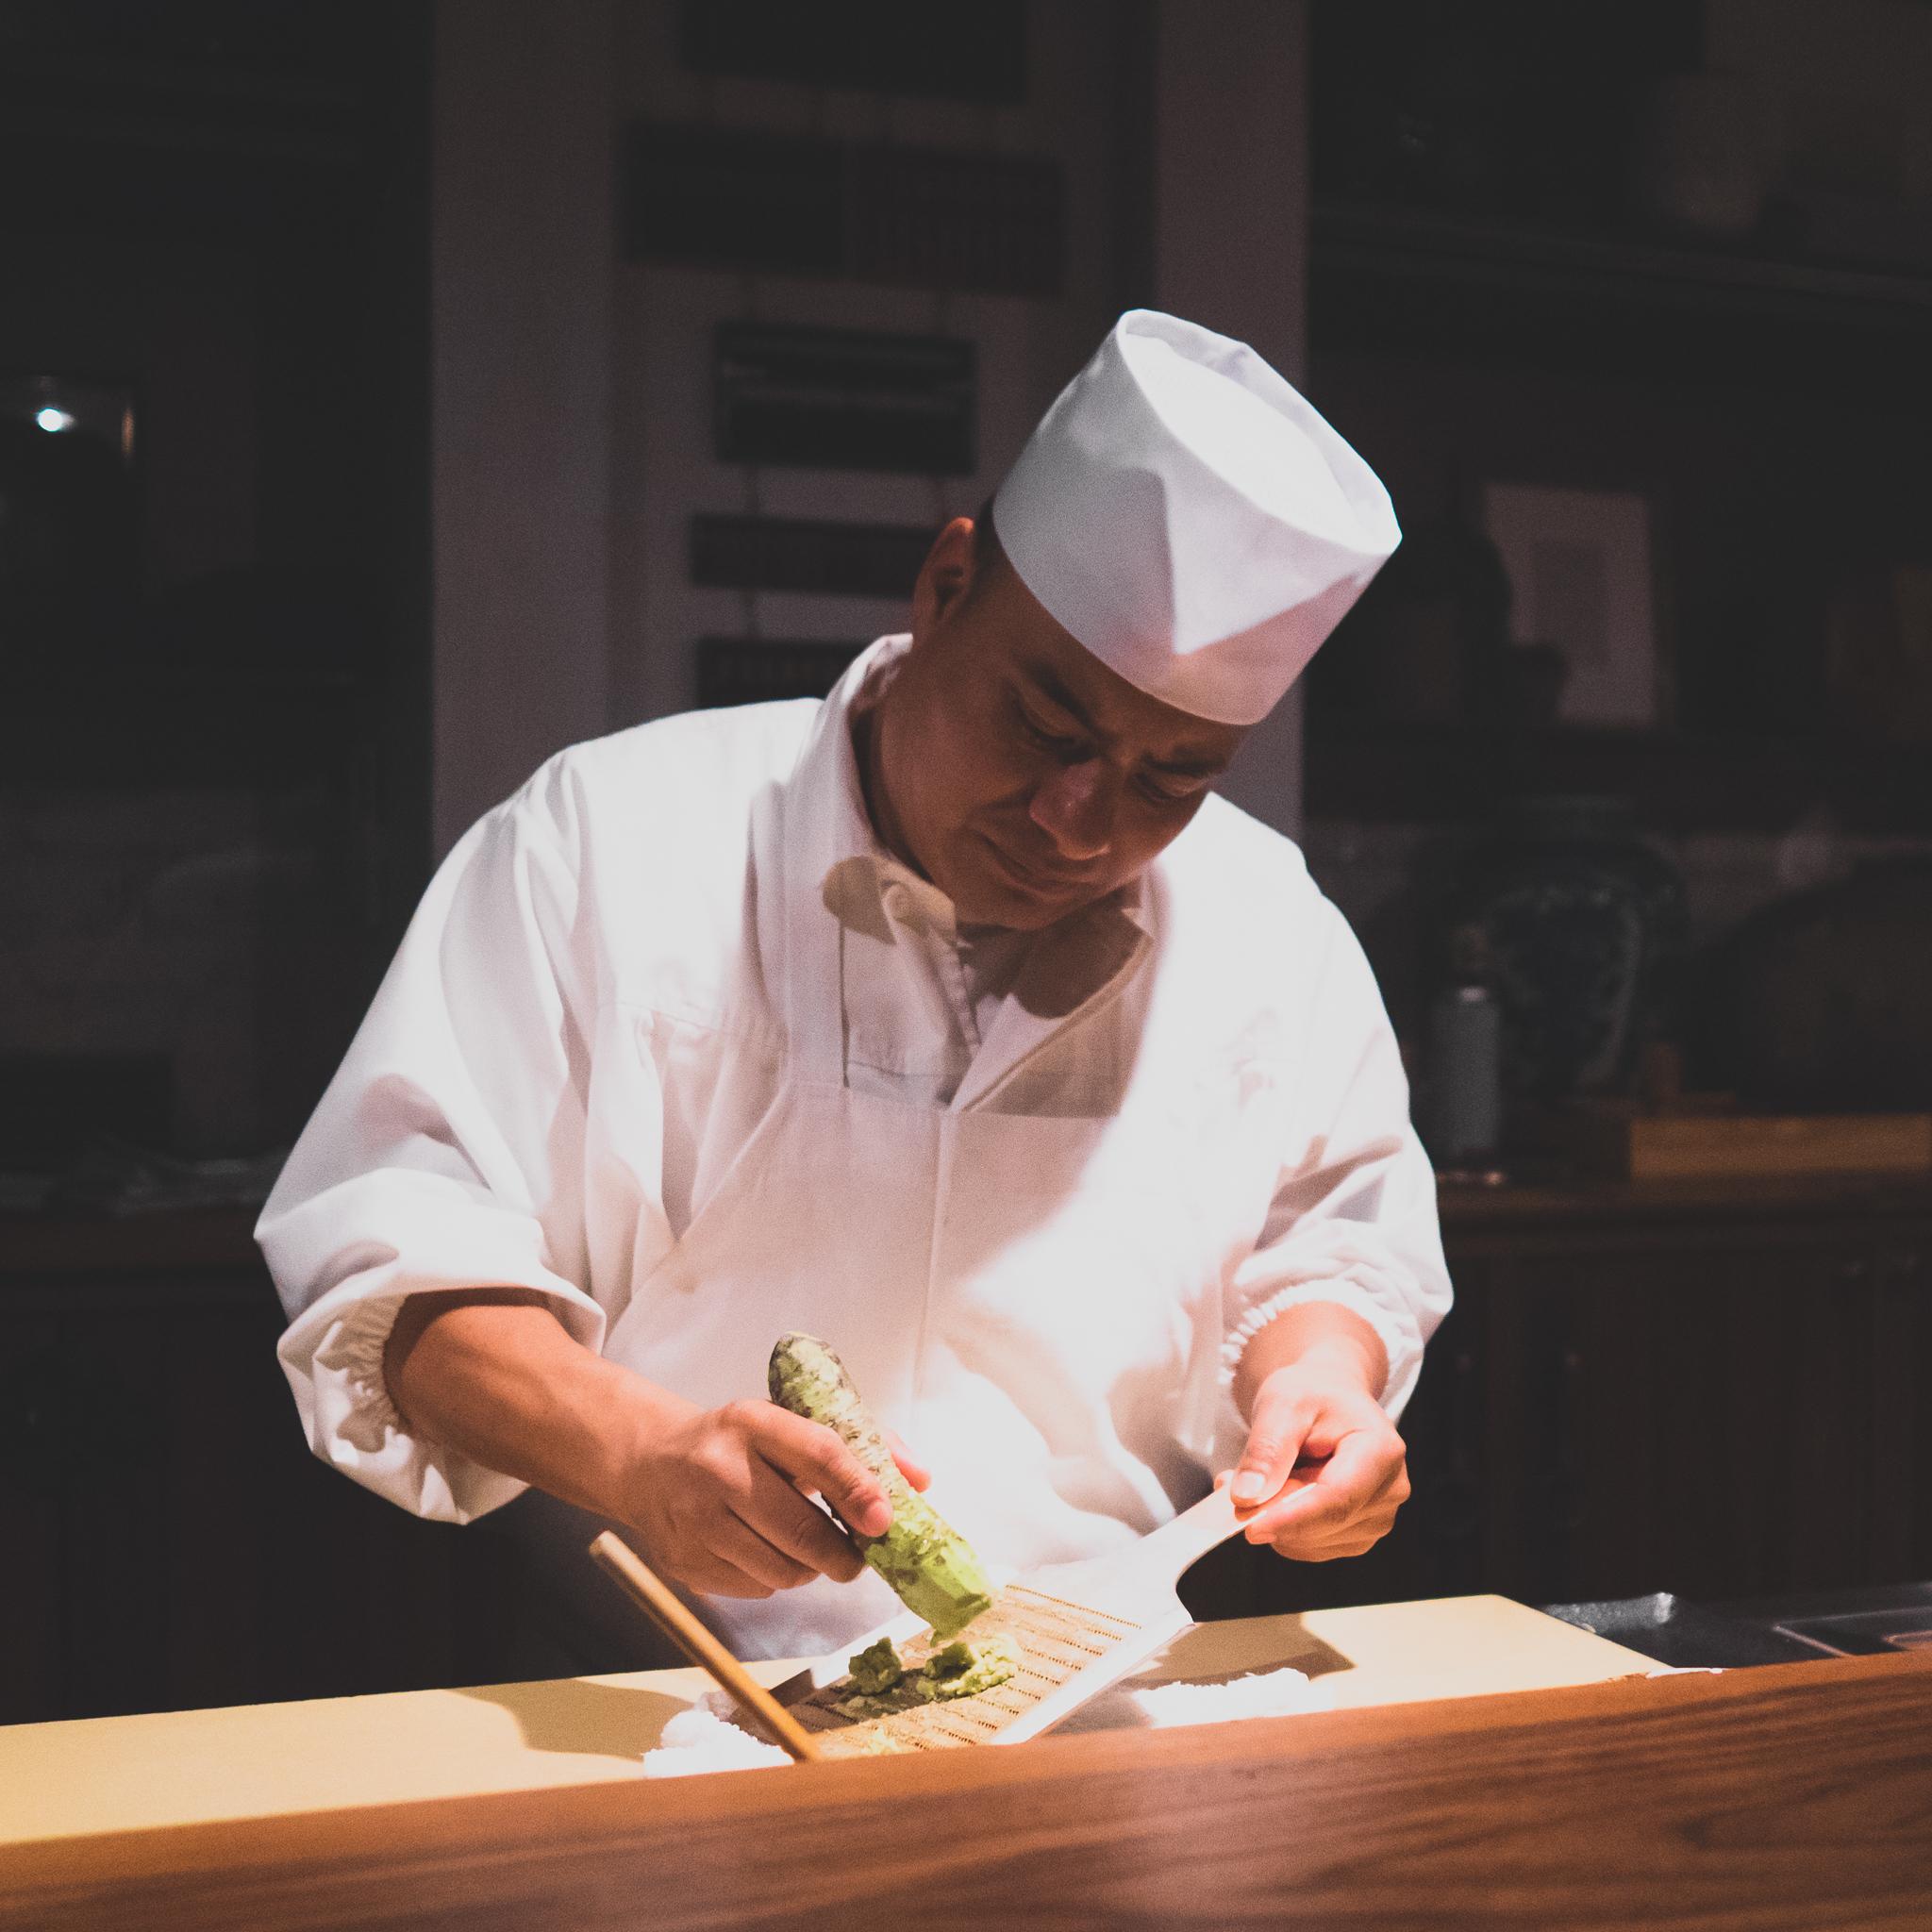 grating fresh wasabi between the tsumami and nigiri sushi courses.